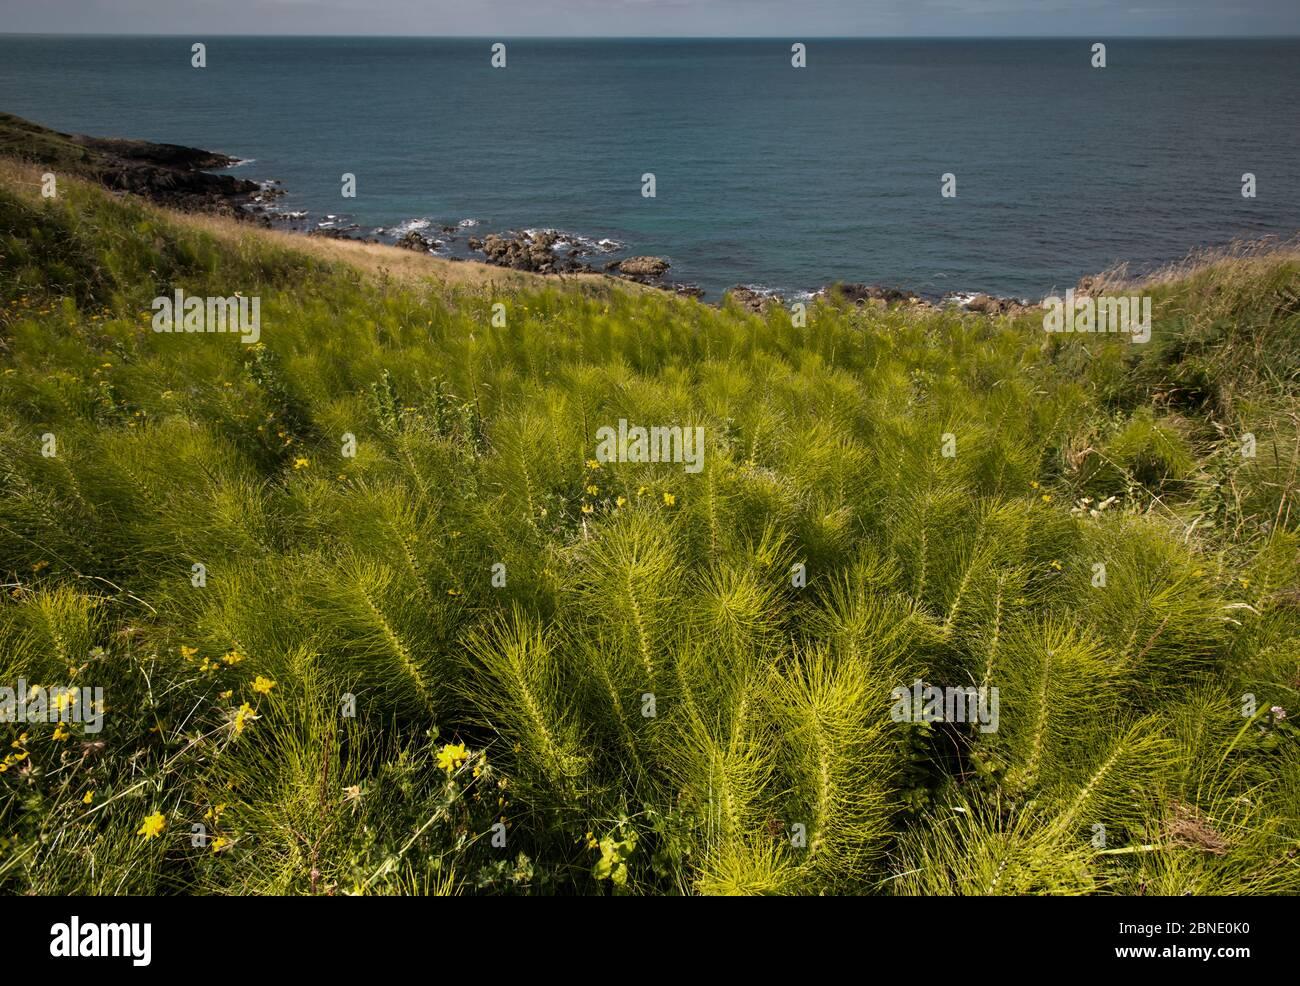 Common Horsetail (Equisetum arvense) growing on the Llyn Peninsular coast, near Nefyn, North Wales Stock Photo